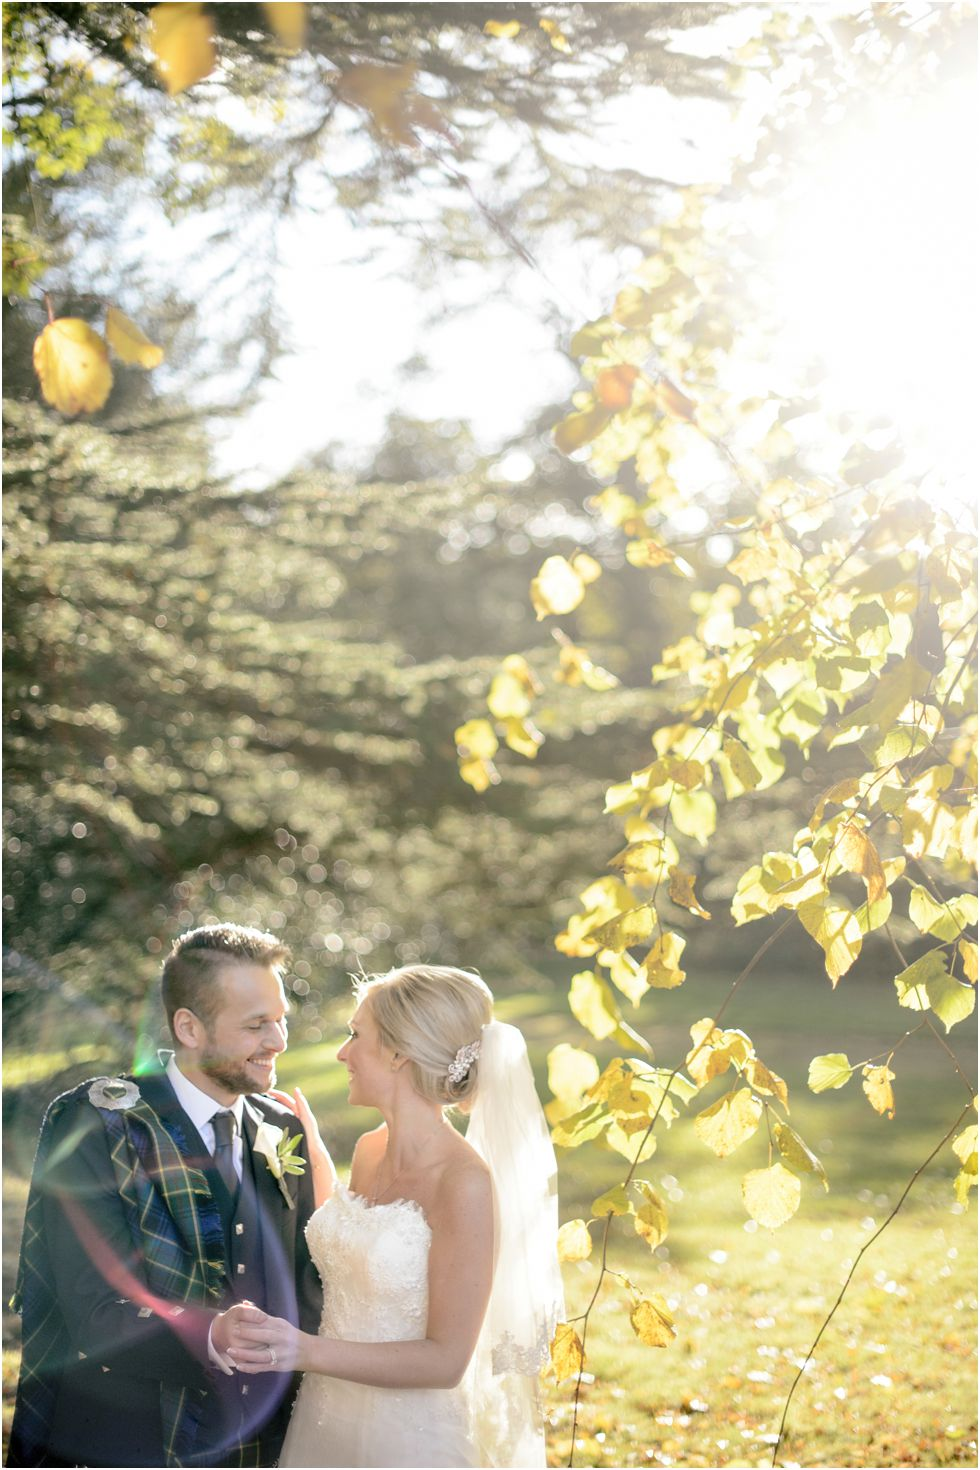 Hopetoun-House-wedding-photography-Edinburgh-51.jpg